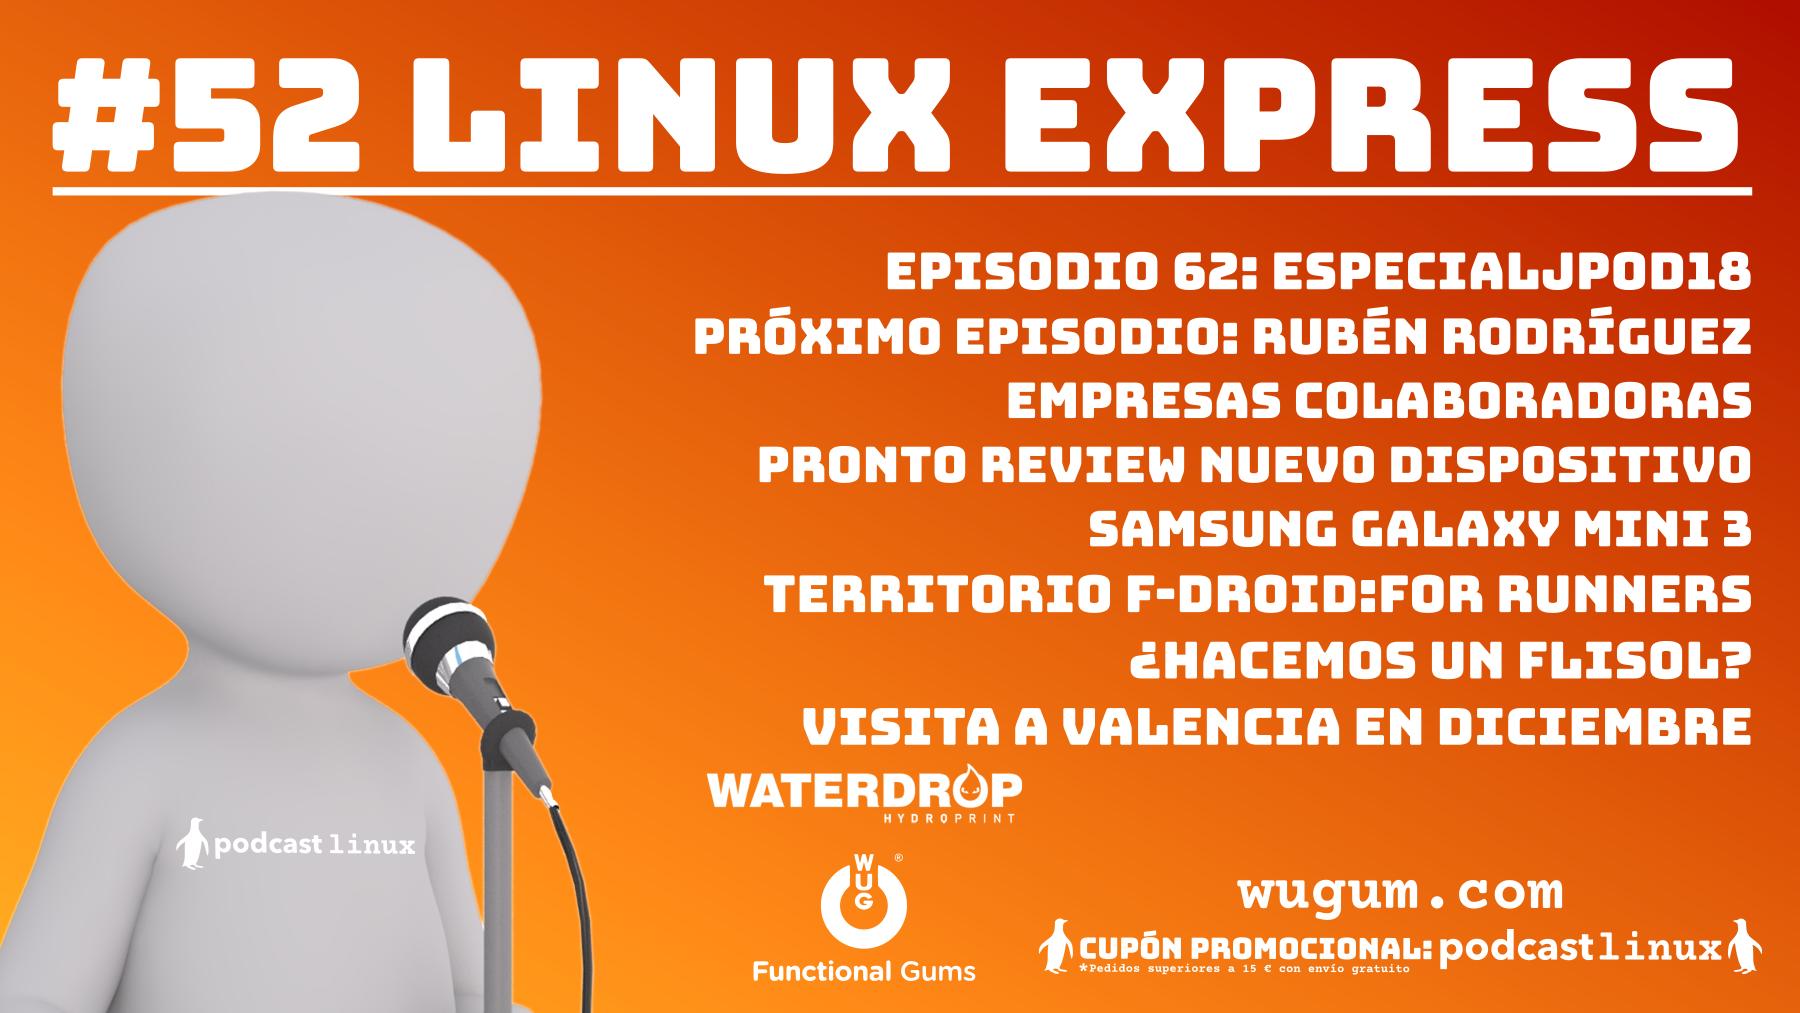 #52 Linux Express